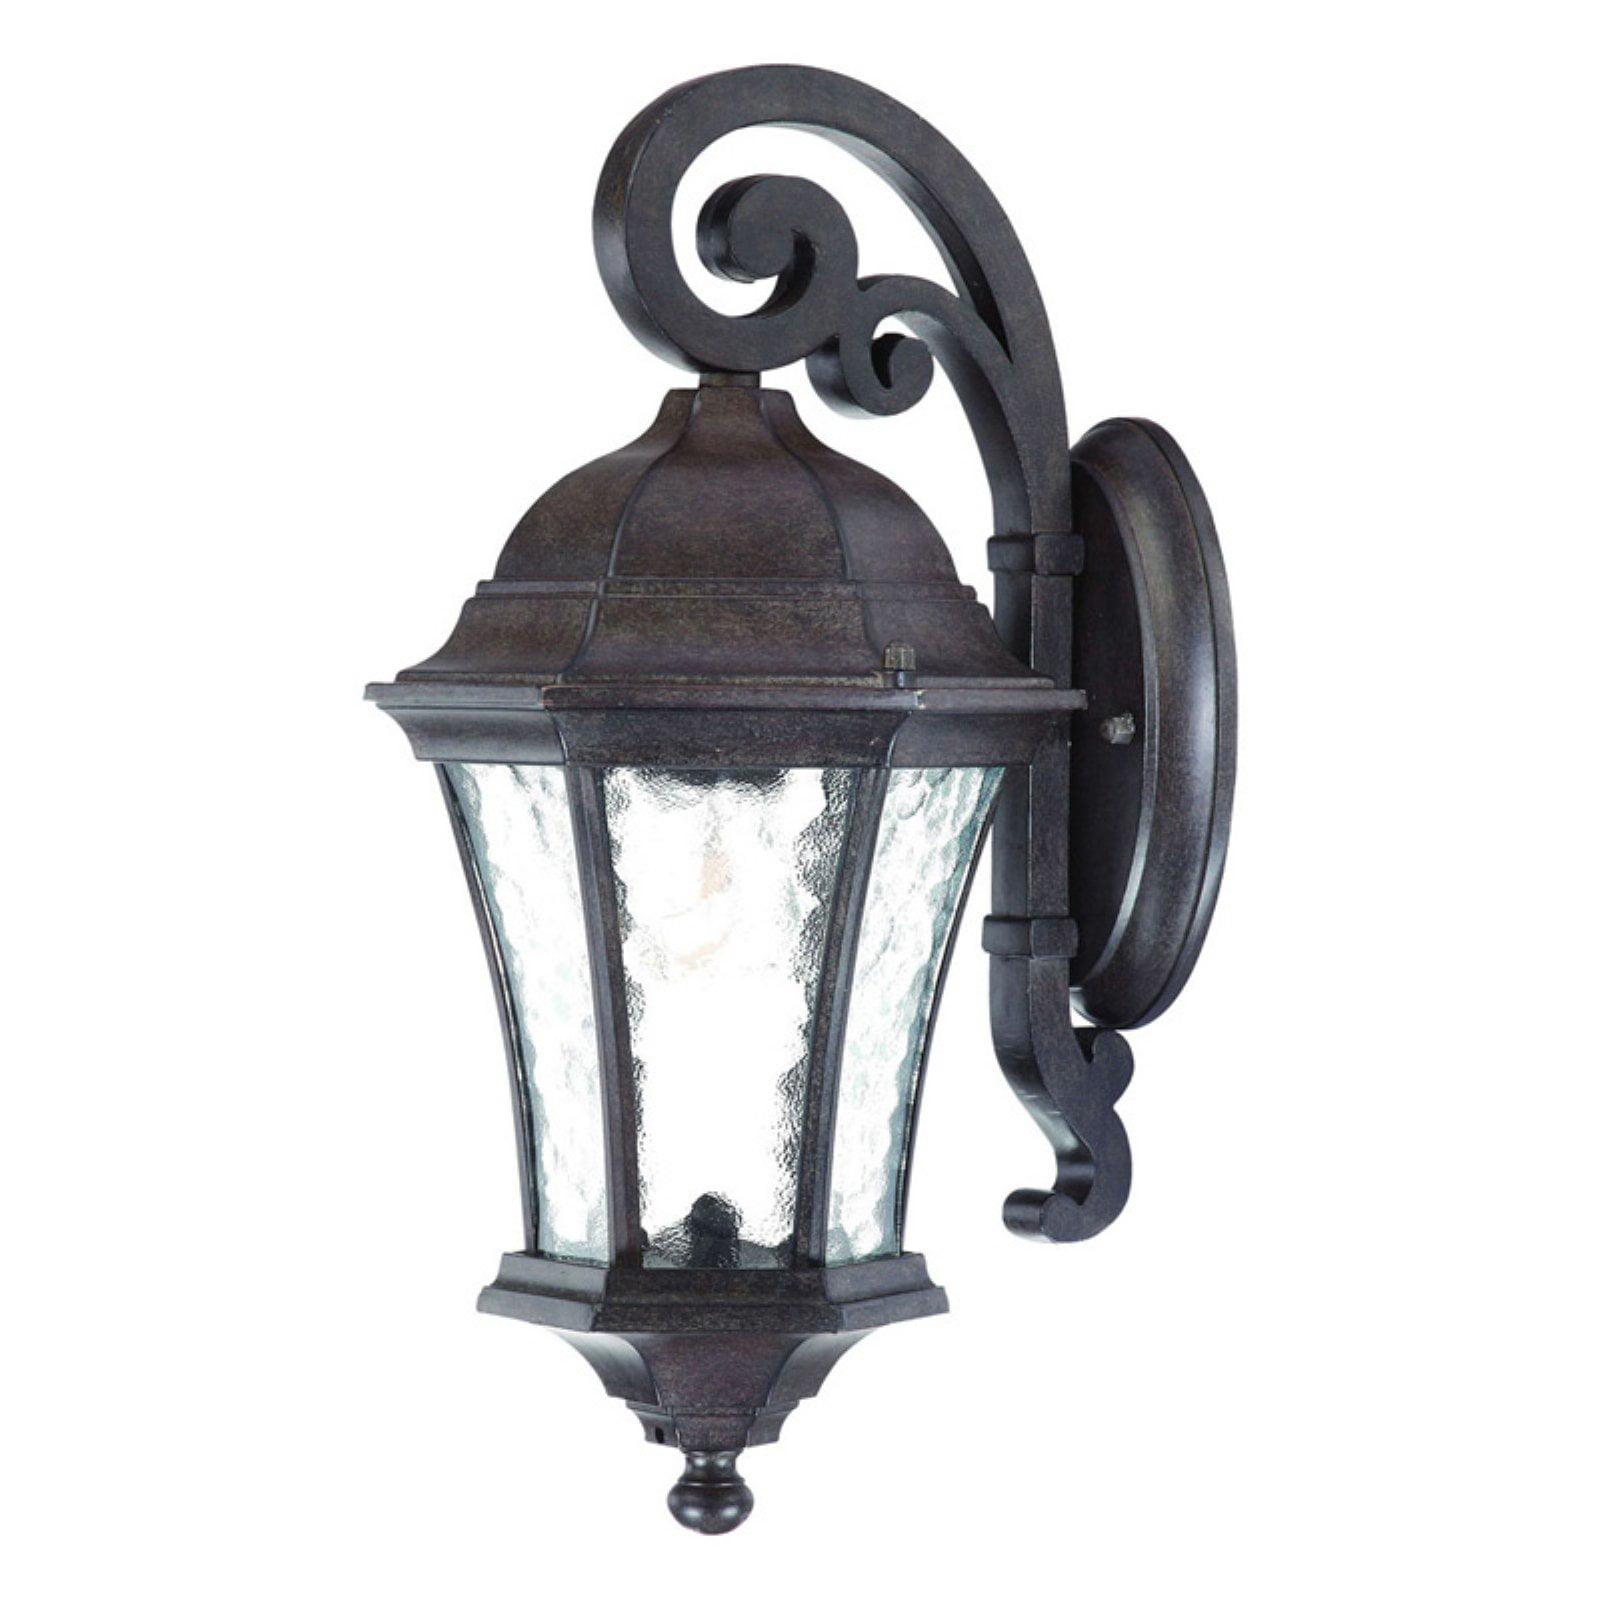 Acclaim Lighting Waverly Outdoor Wall Mount Light Fixture